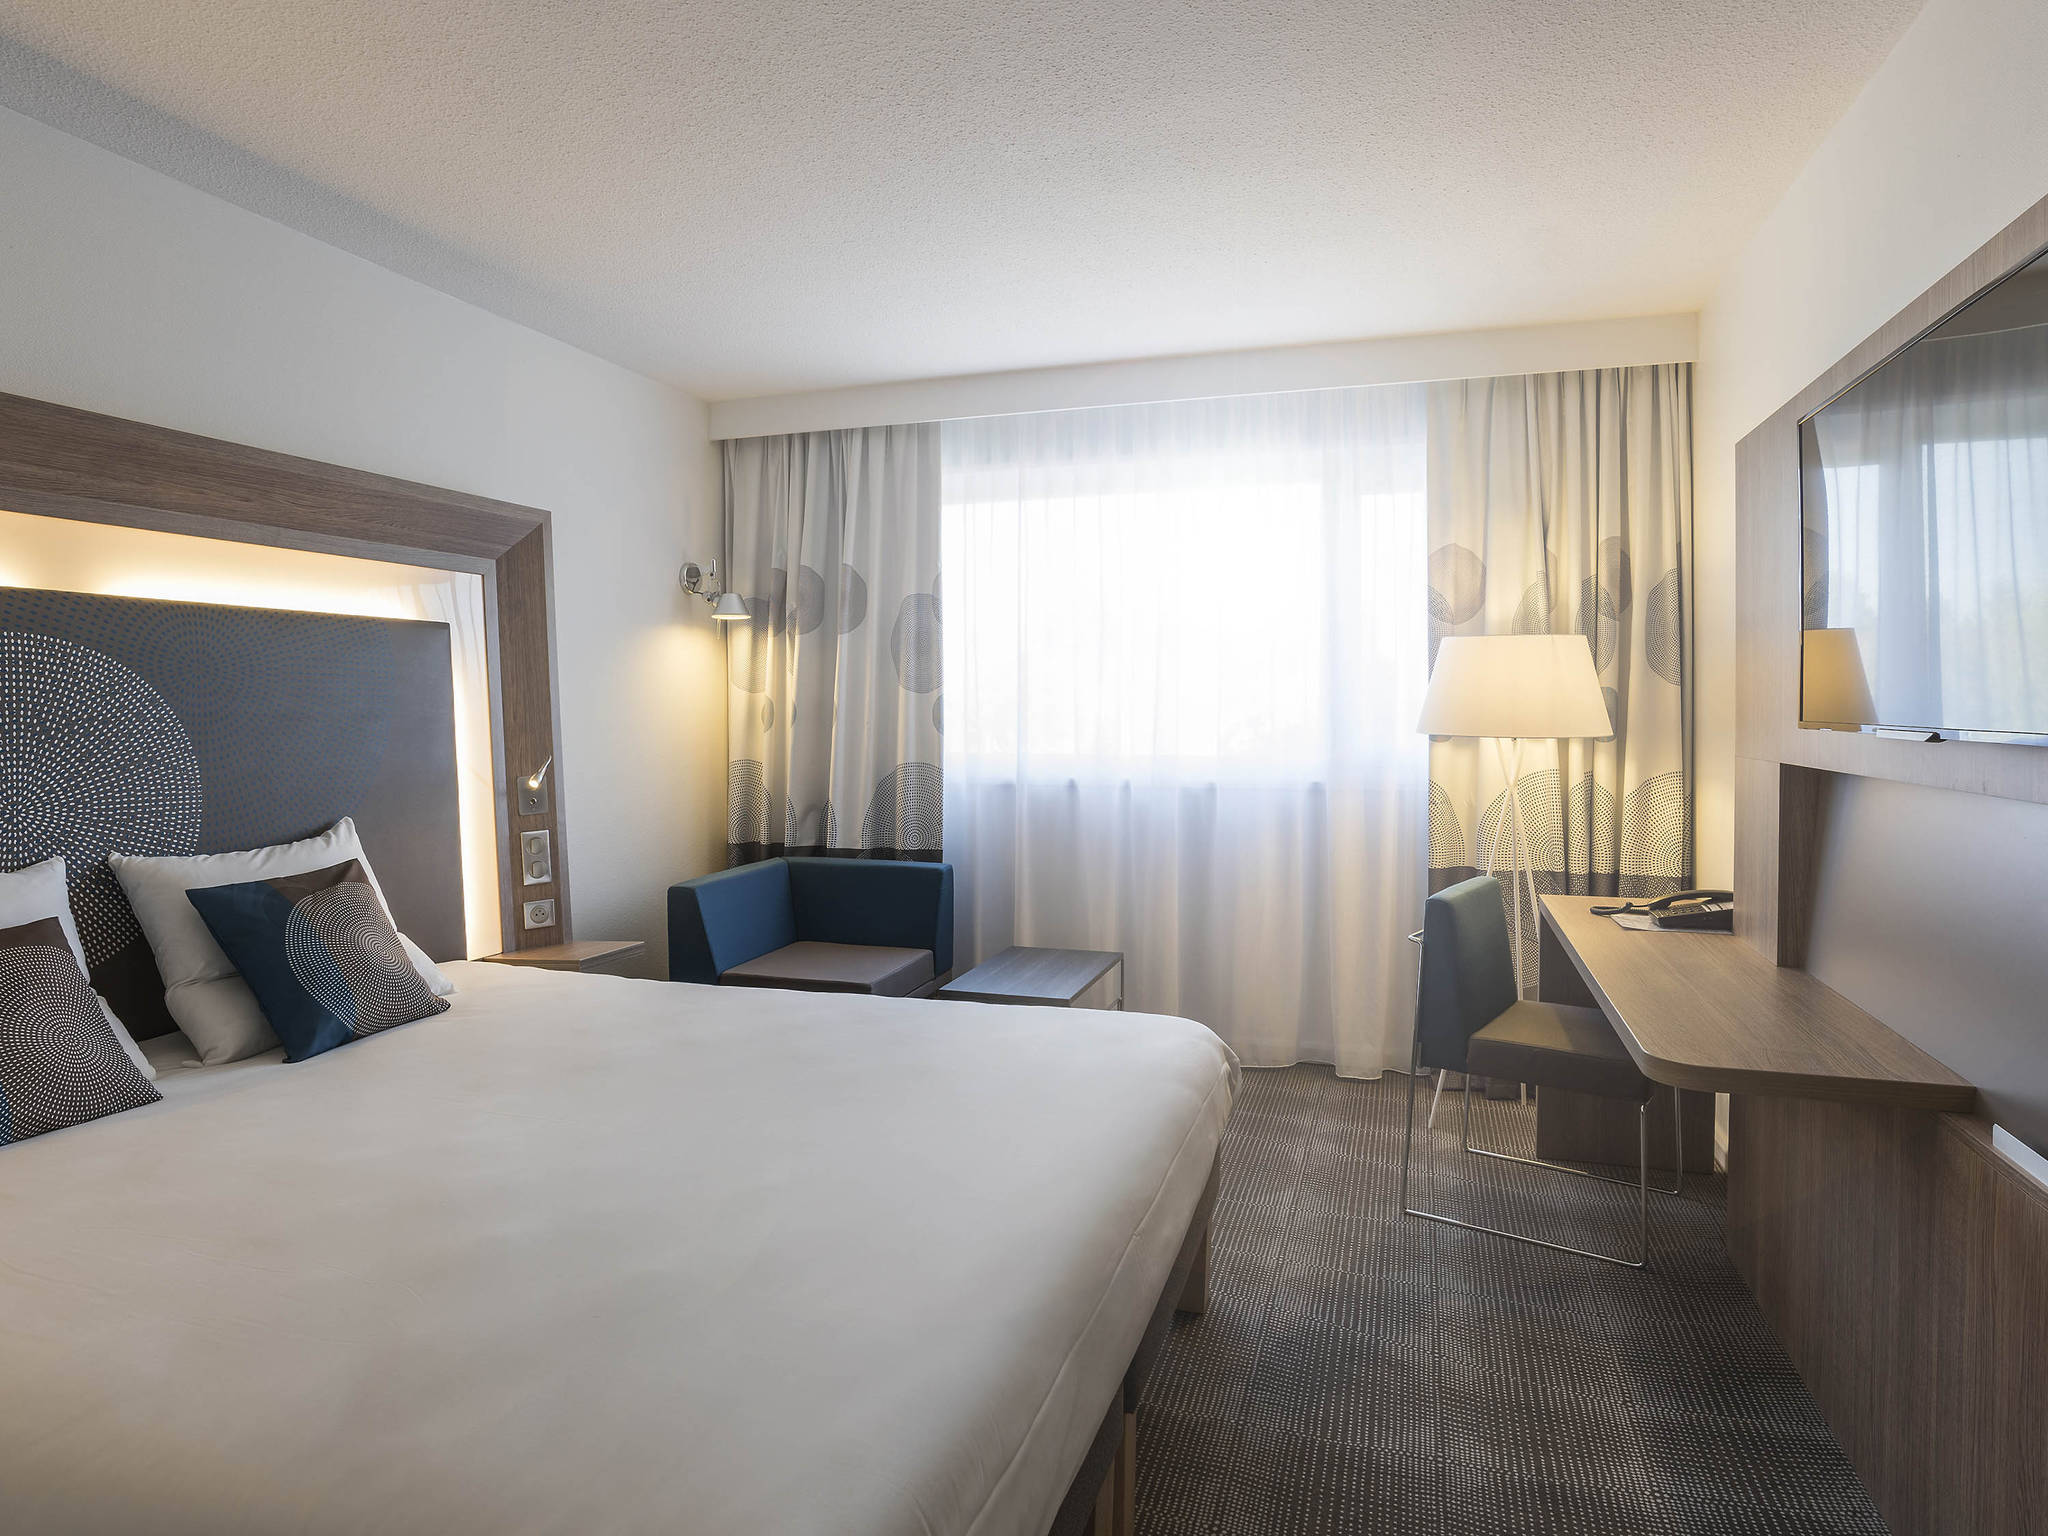 Rooms Novotel Paris Nord Expo